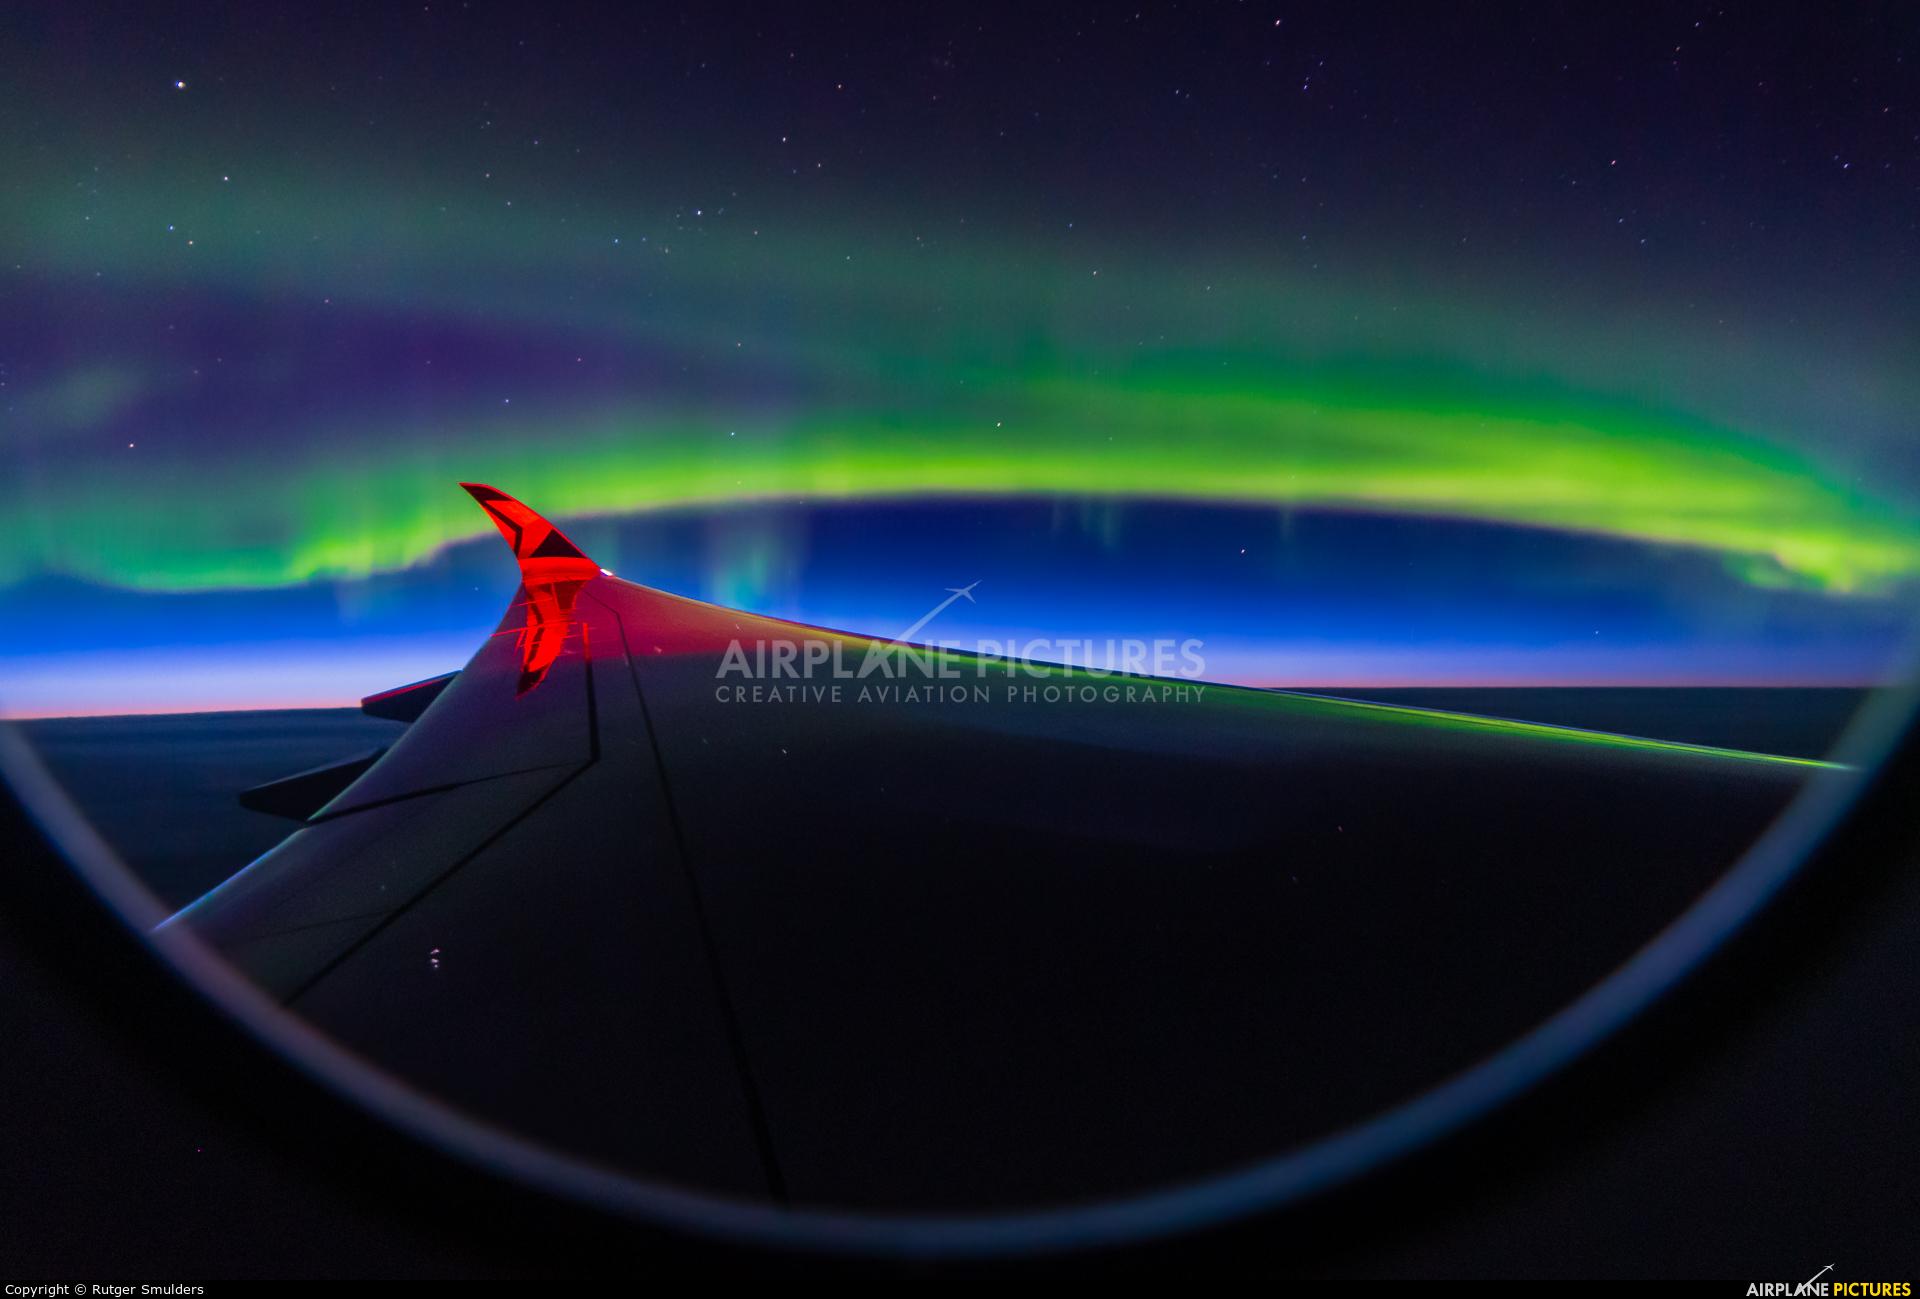 Delta Air Lines N501DN aircraft at In Flight - Greenland